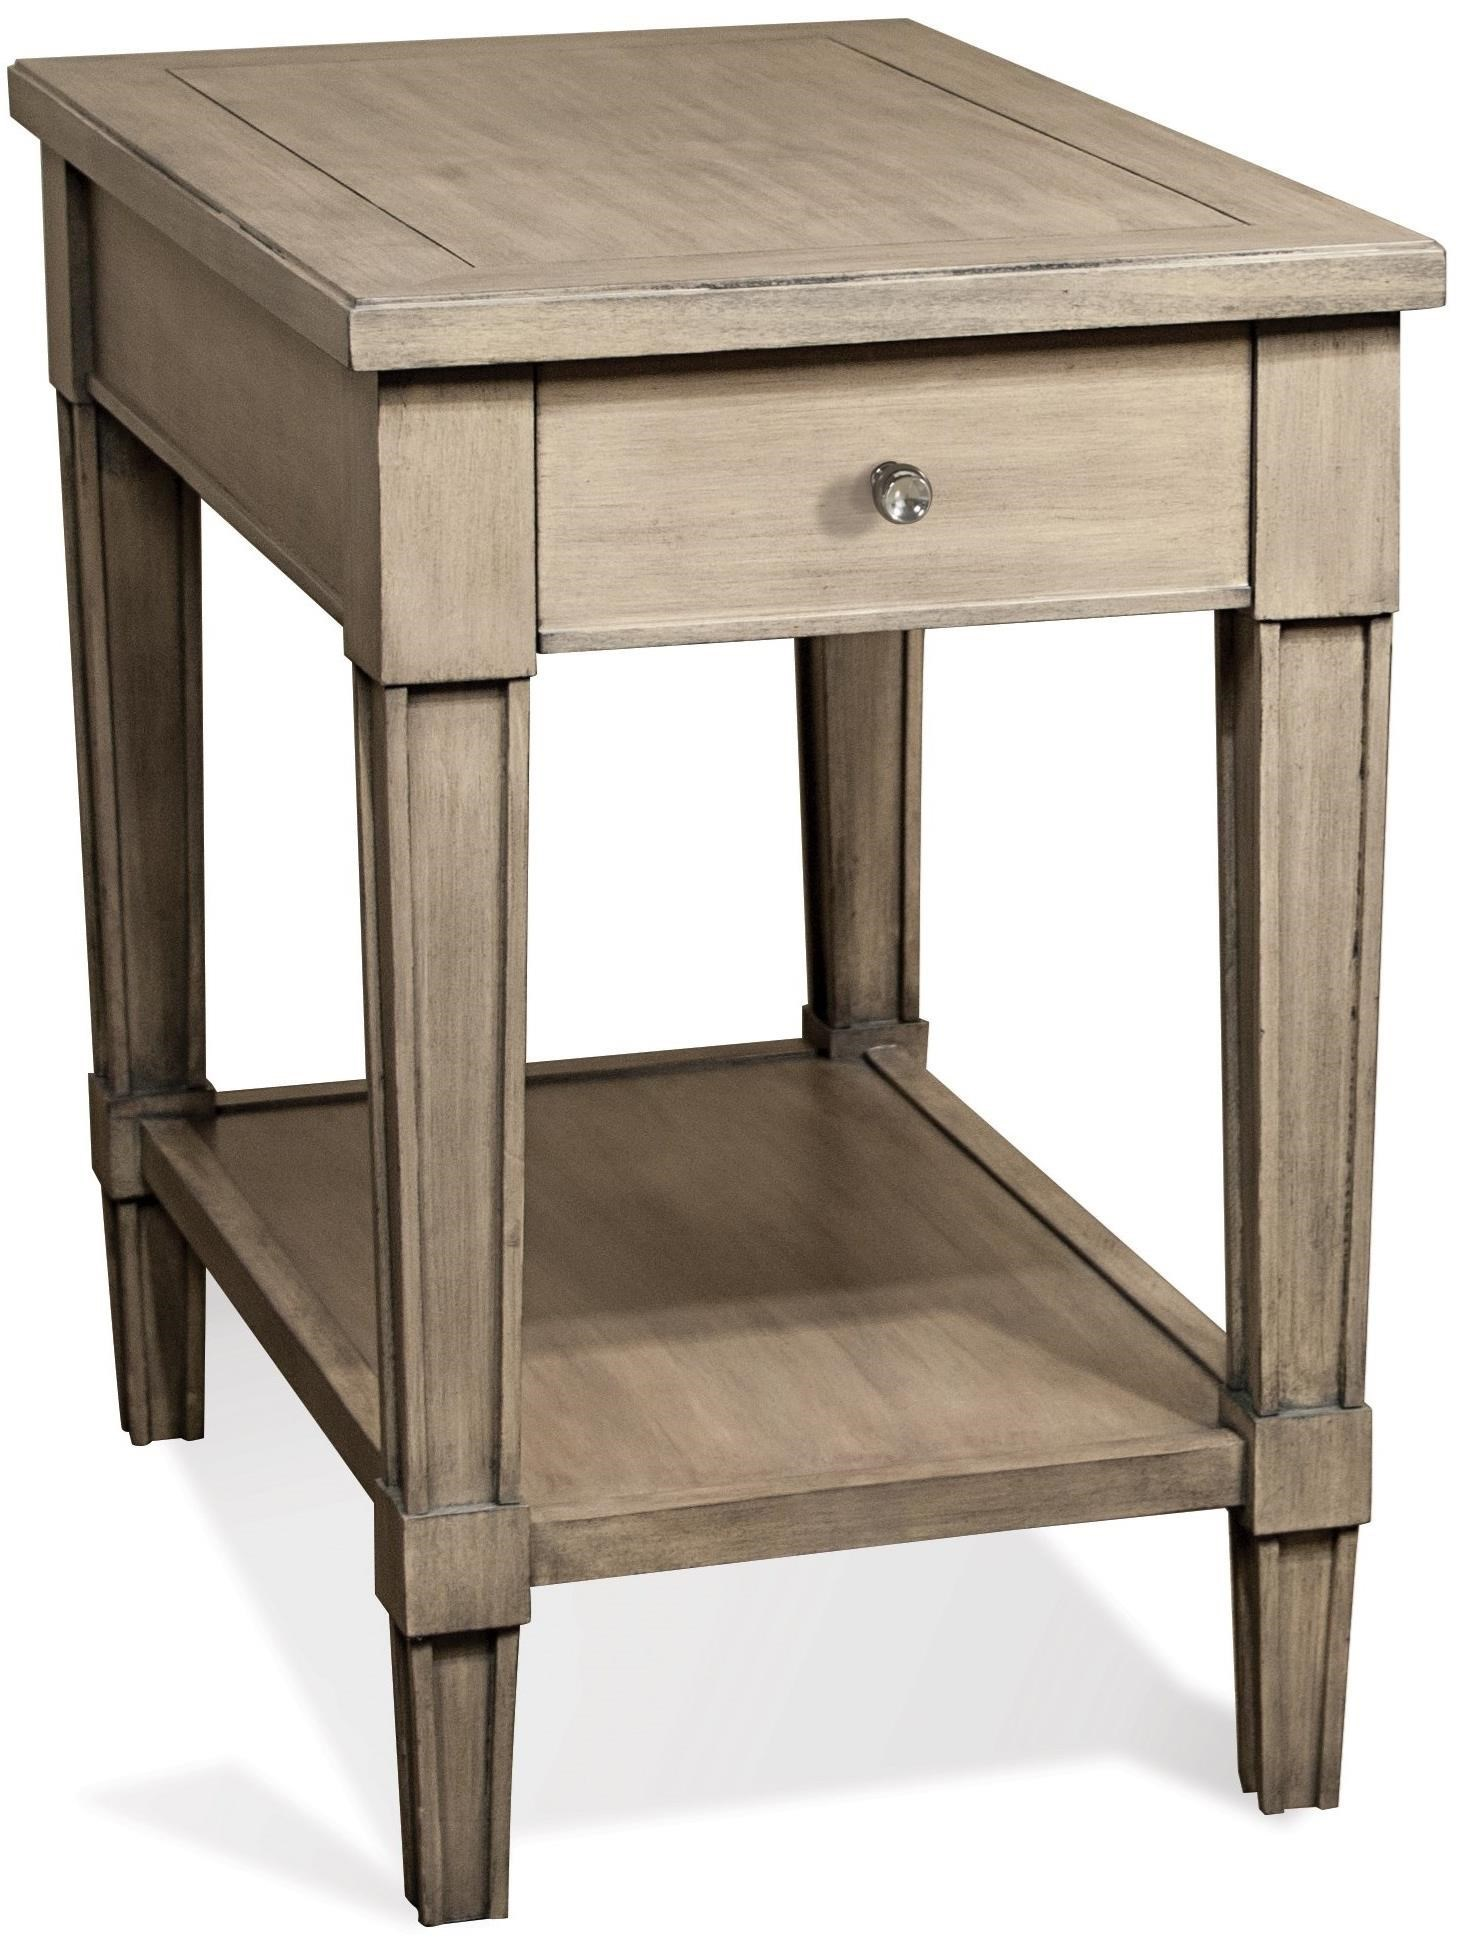 Riverside Furniture Parkdale 1 Drawer Rectangle Chairside Table   Darvin  Furniture   End Table